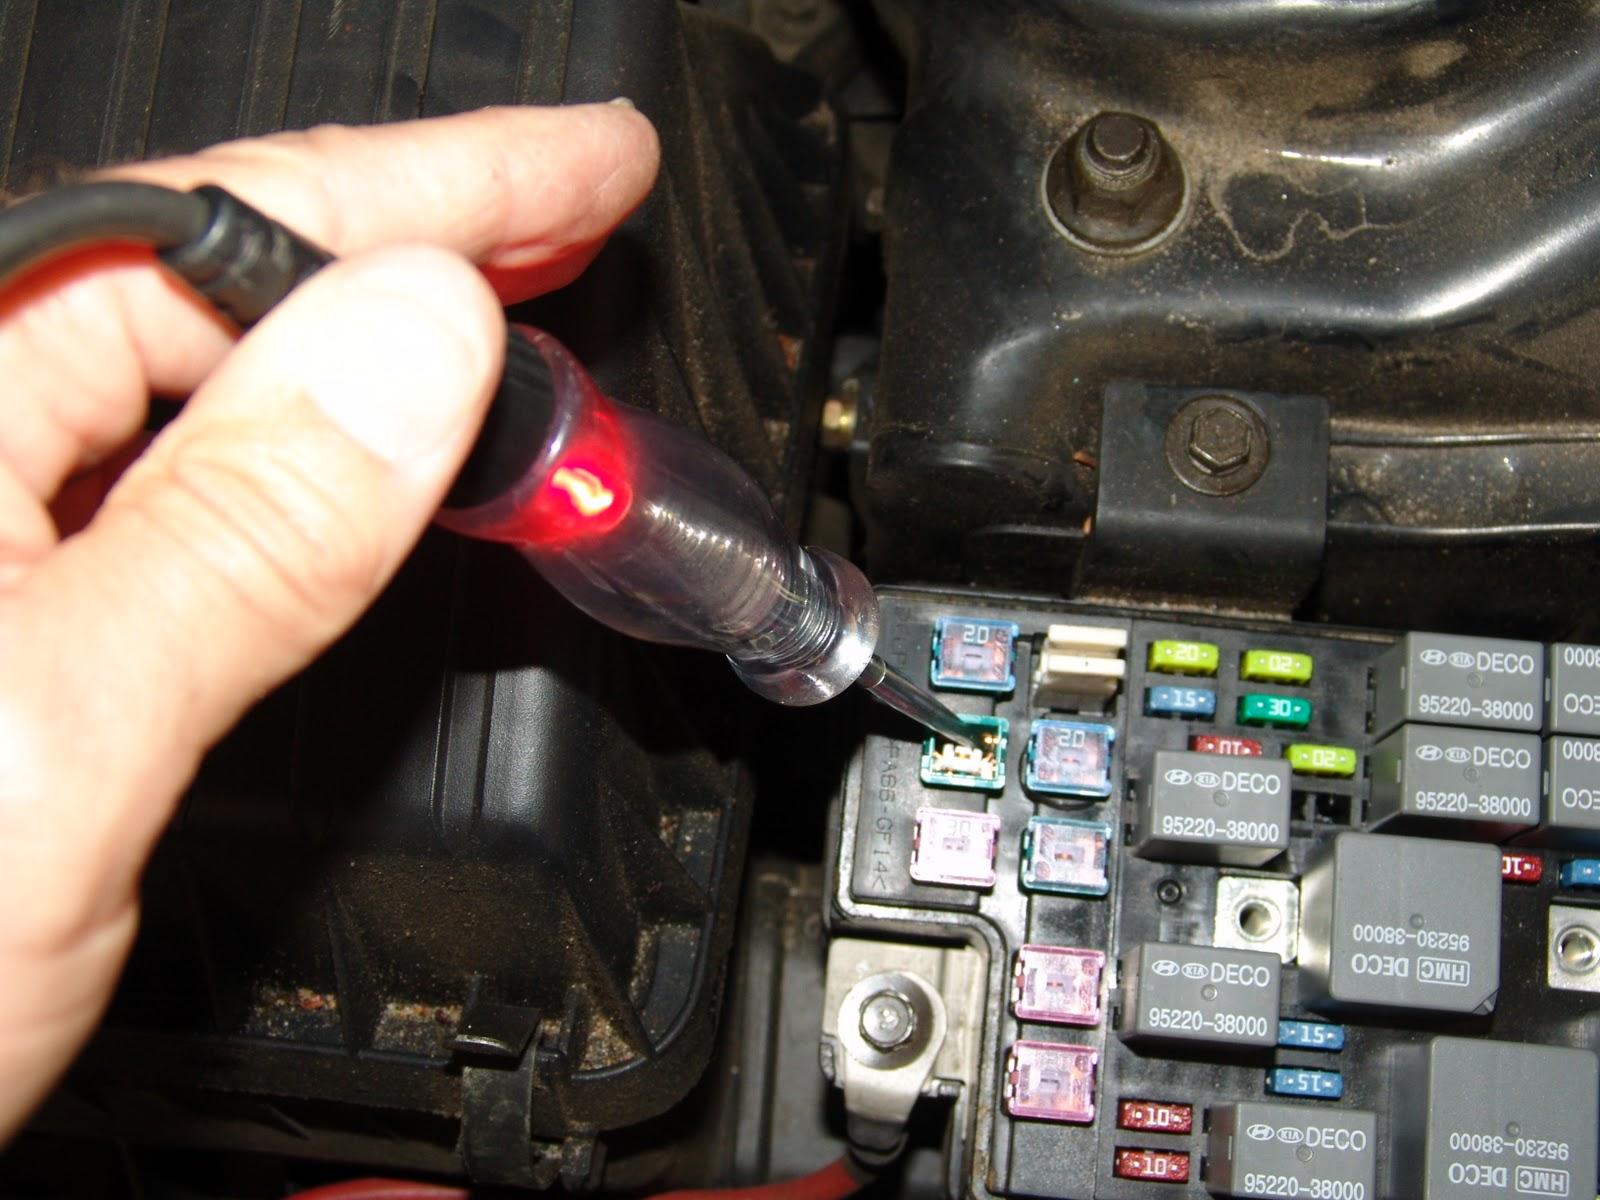 2002 Pt Cruiser Headlight Wiring Diagram Dewalt Table Saw Parts Kia Optima Relay Location Get Free Image About